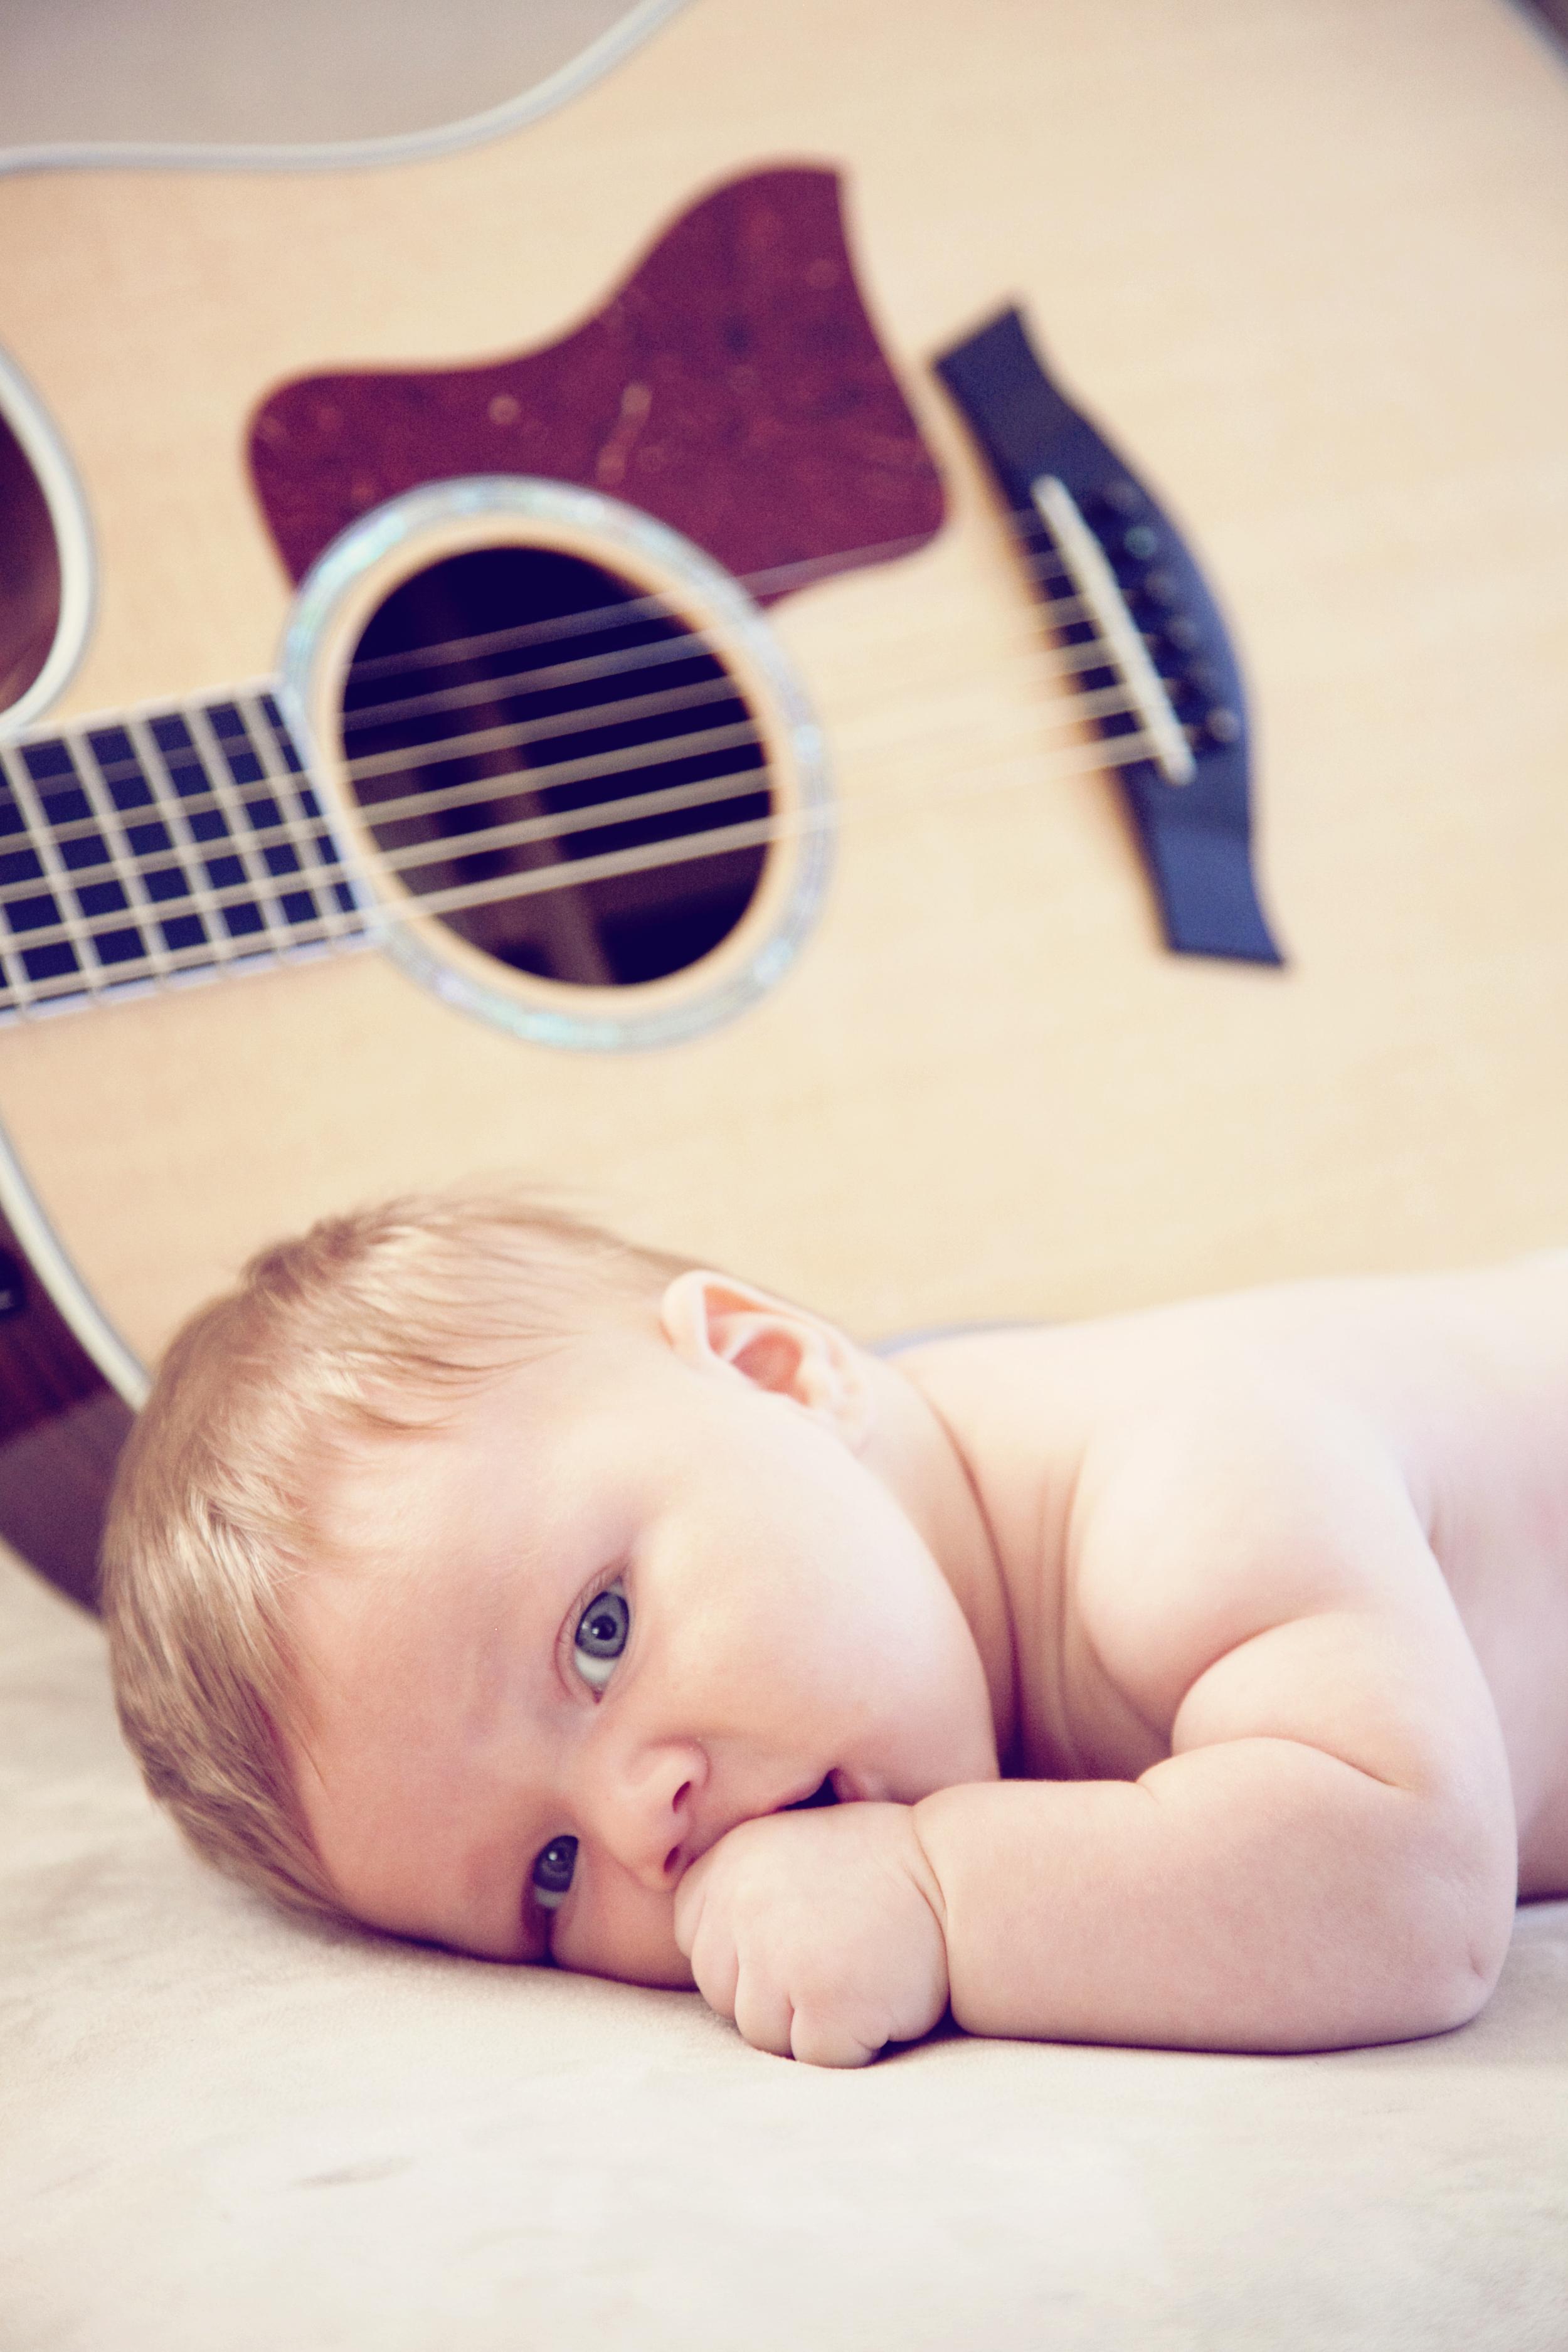 Baby Noah and guitar